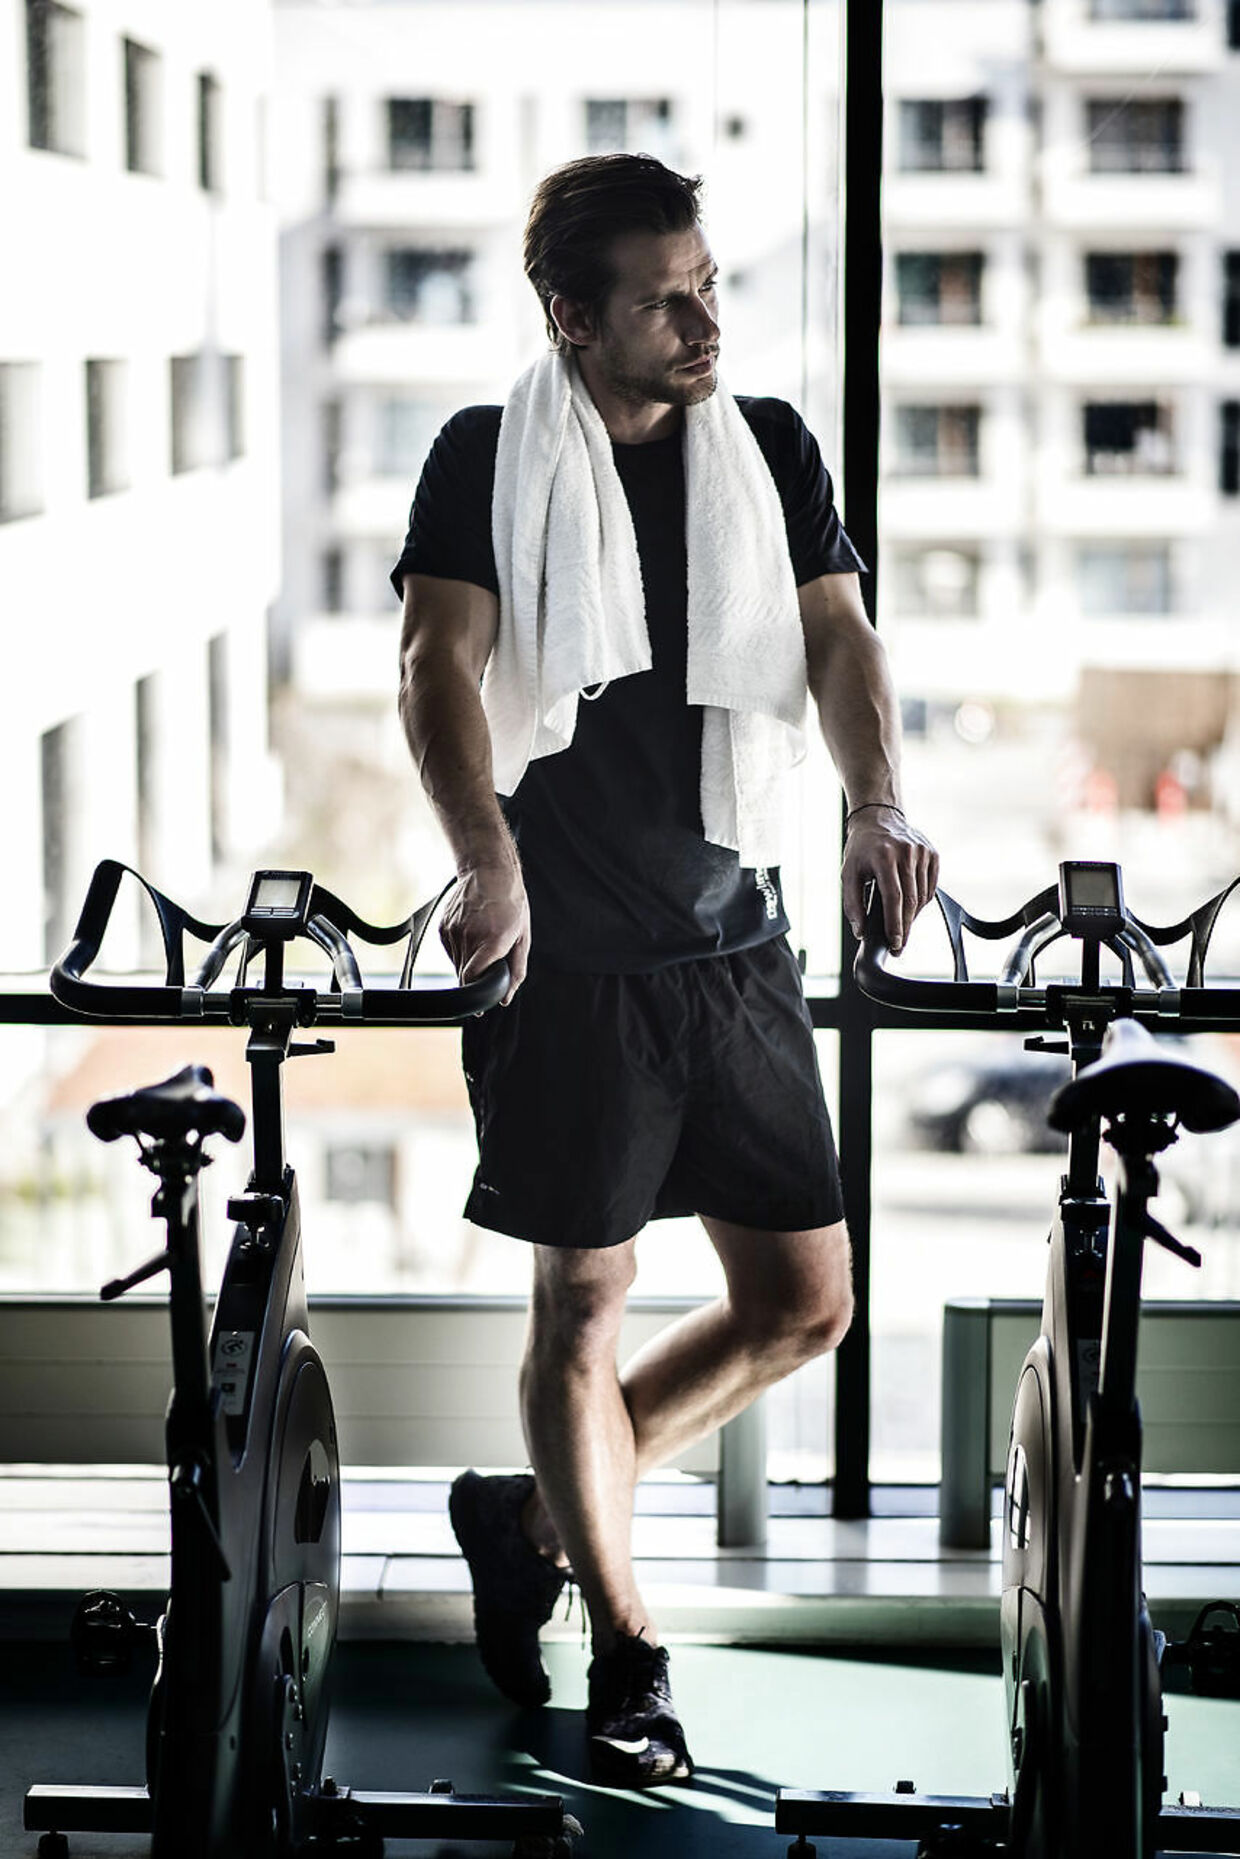 Christian Bitz fotograferet i Fitness DK på Fisketorvet i København.